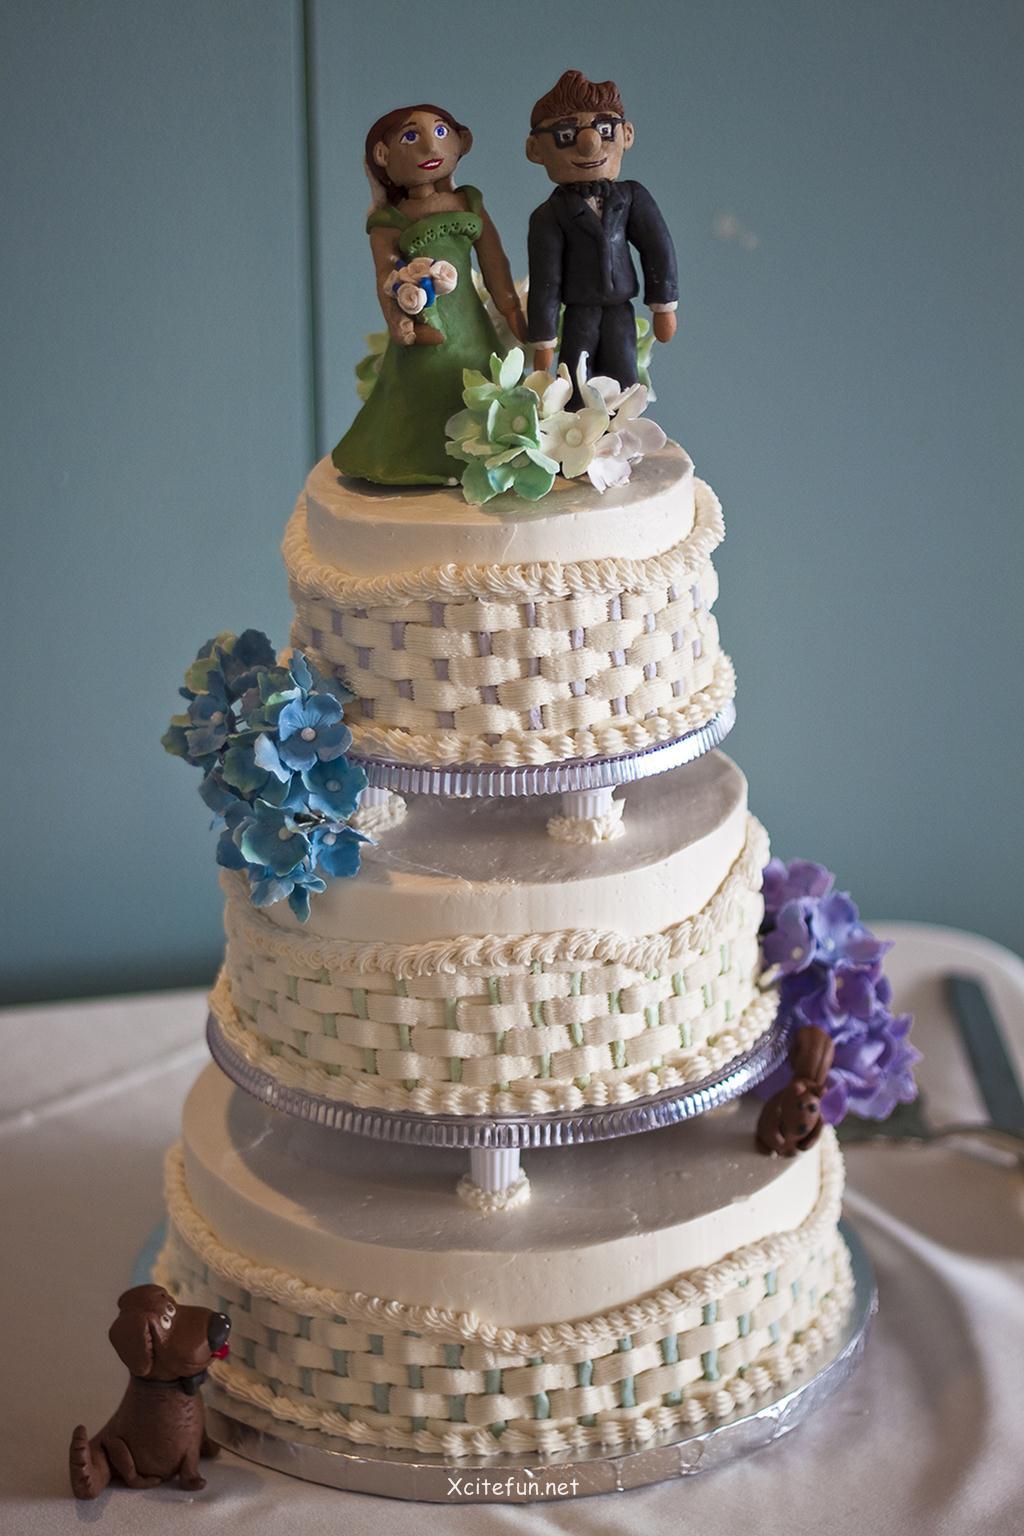 Wedding Cakes Decoration  Wedding Cakes Decorating Ideas XciteFun